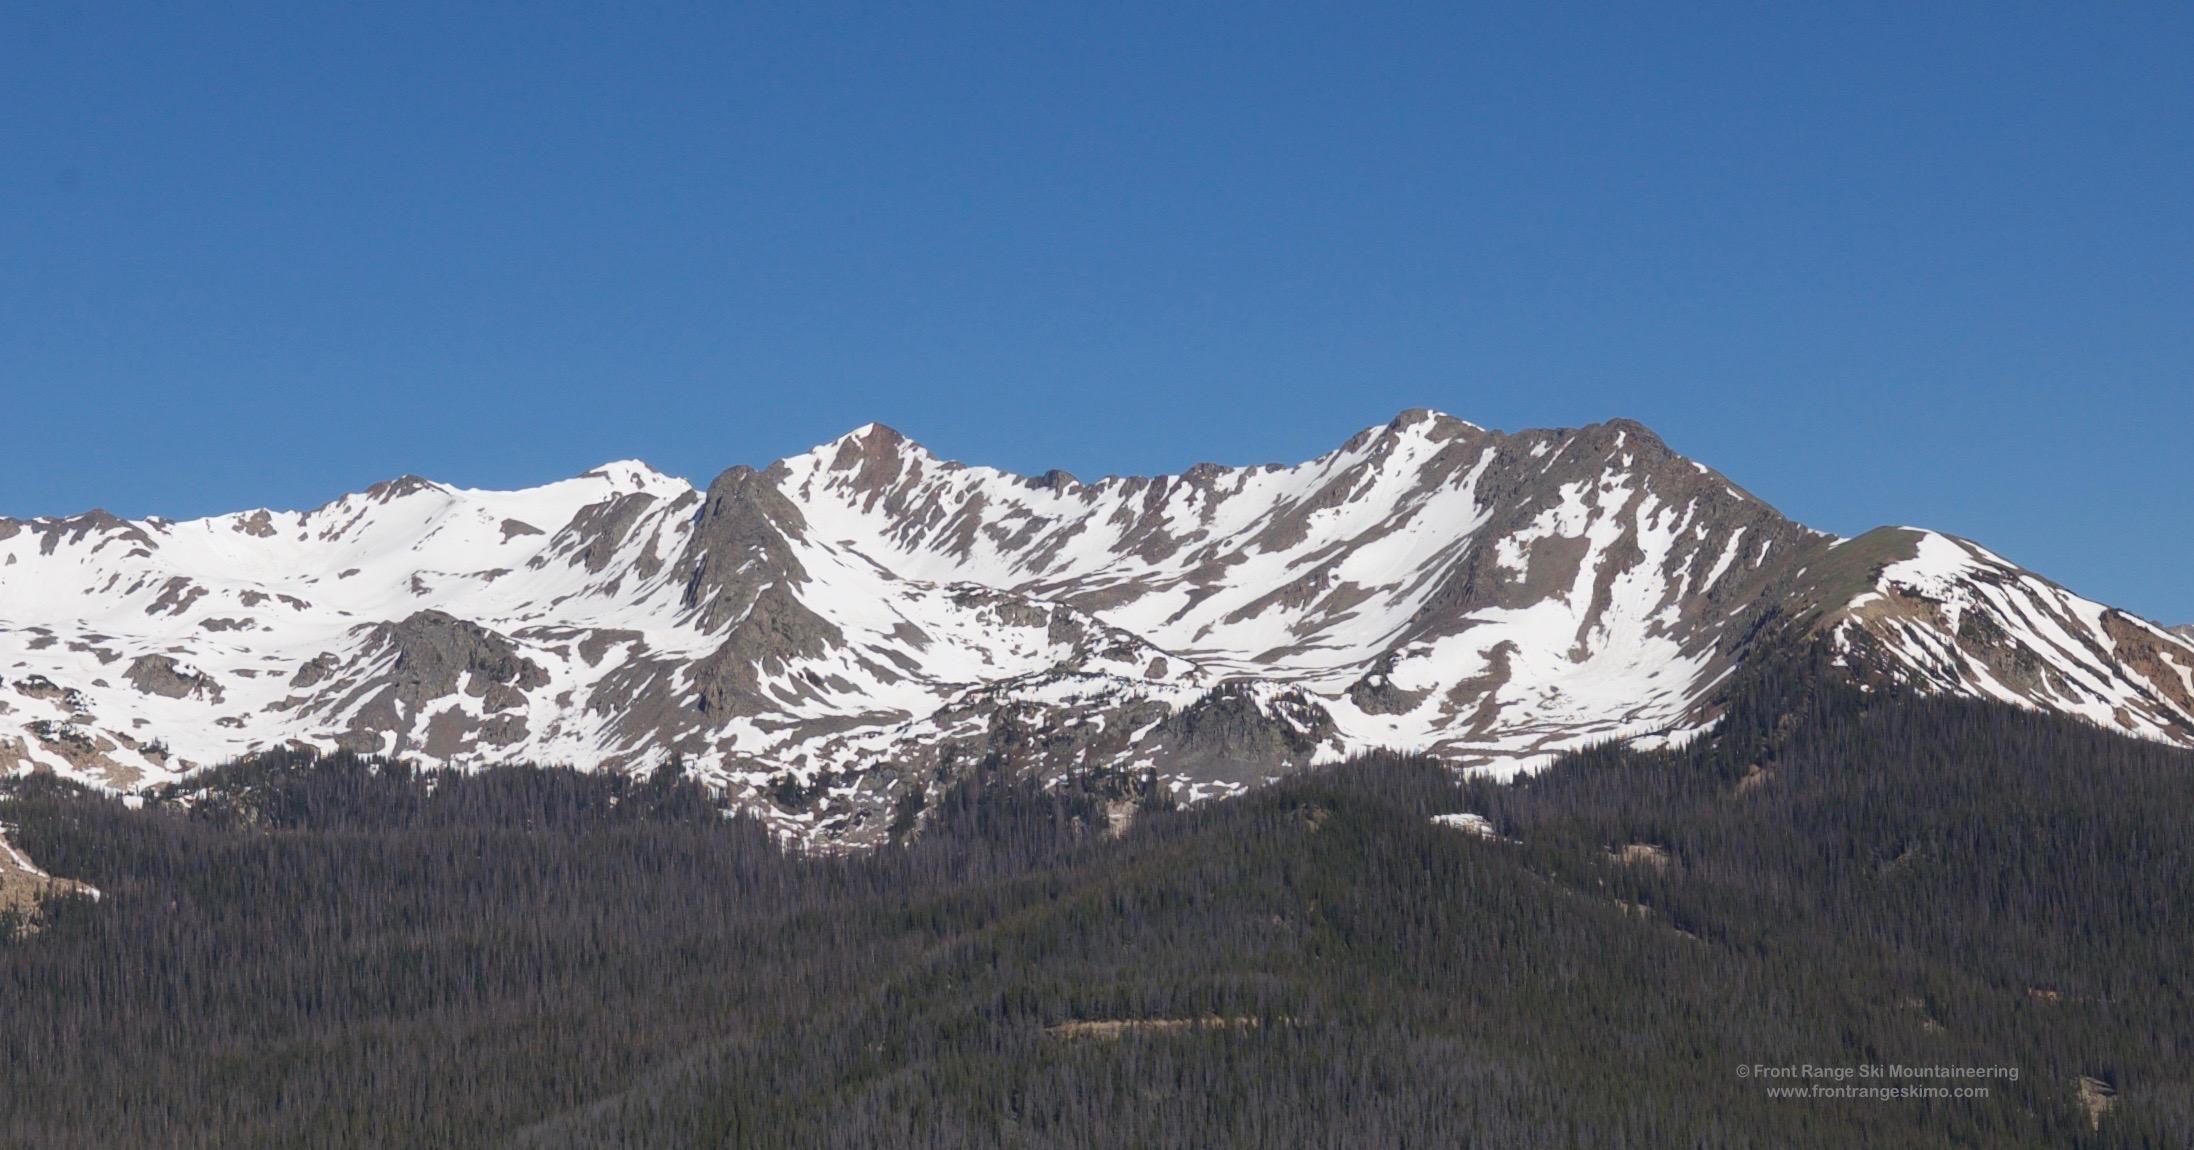 Howard Mountain as seen from Trail Ridge Road.